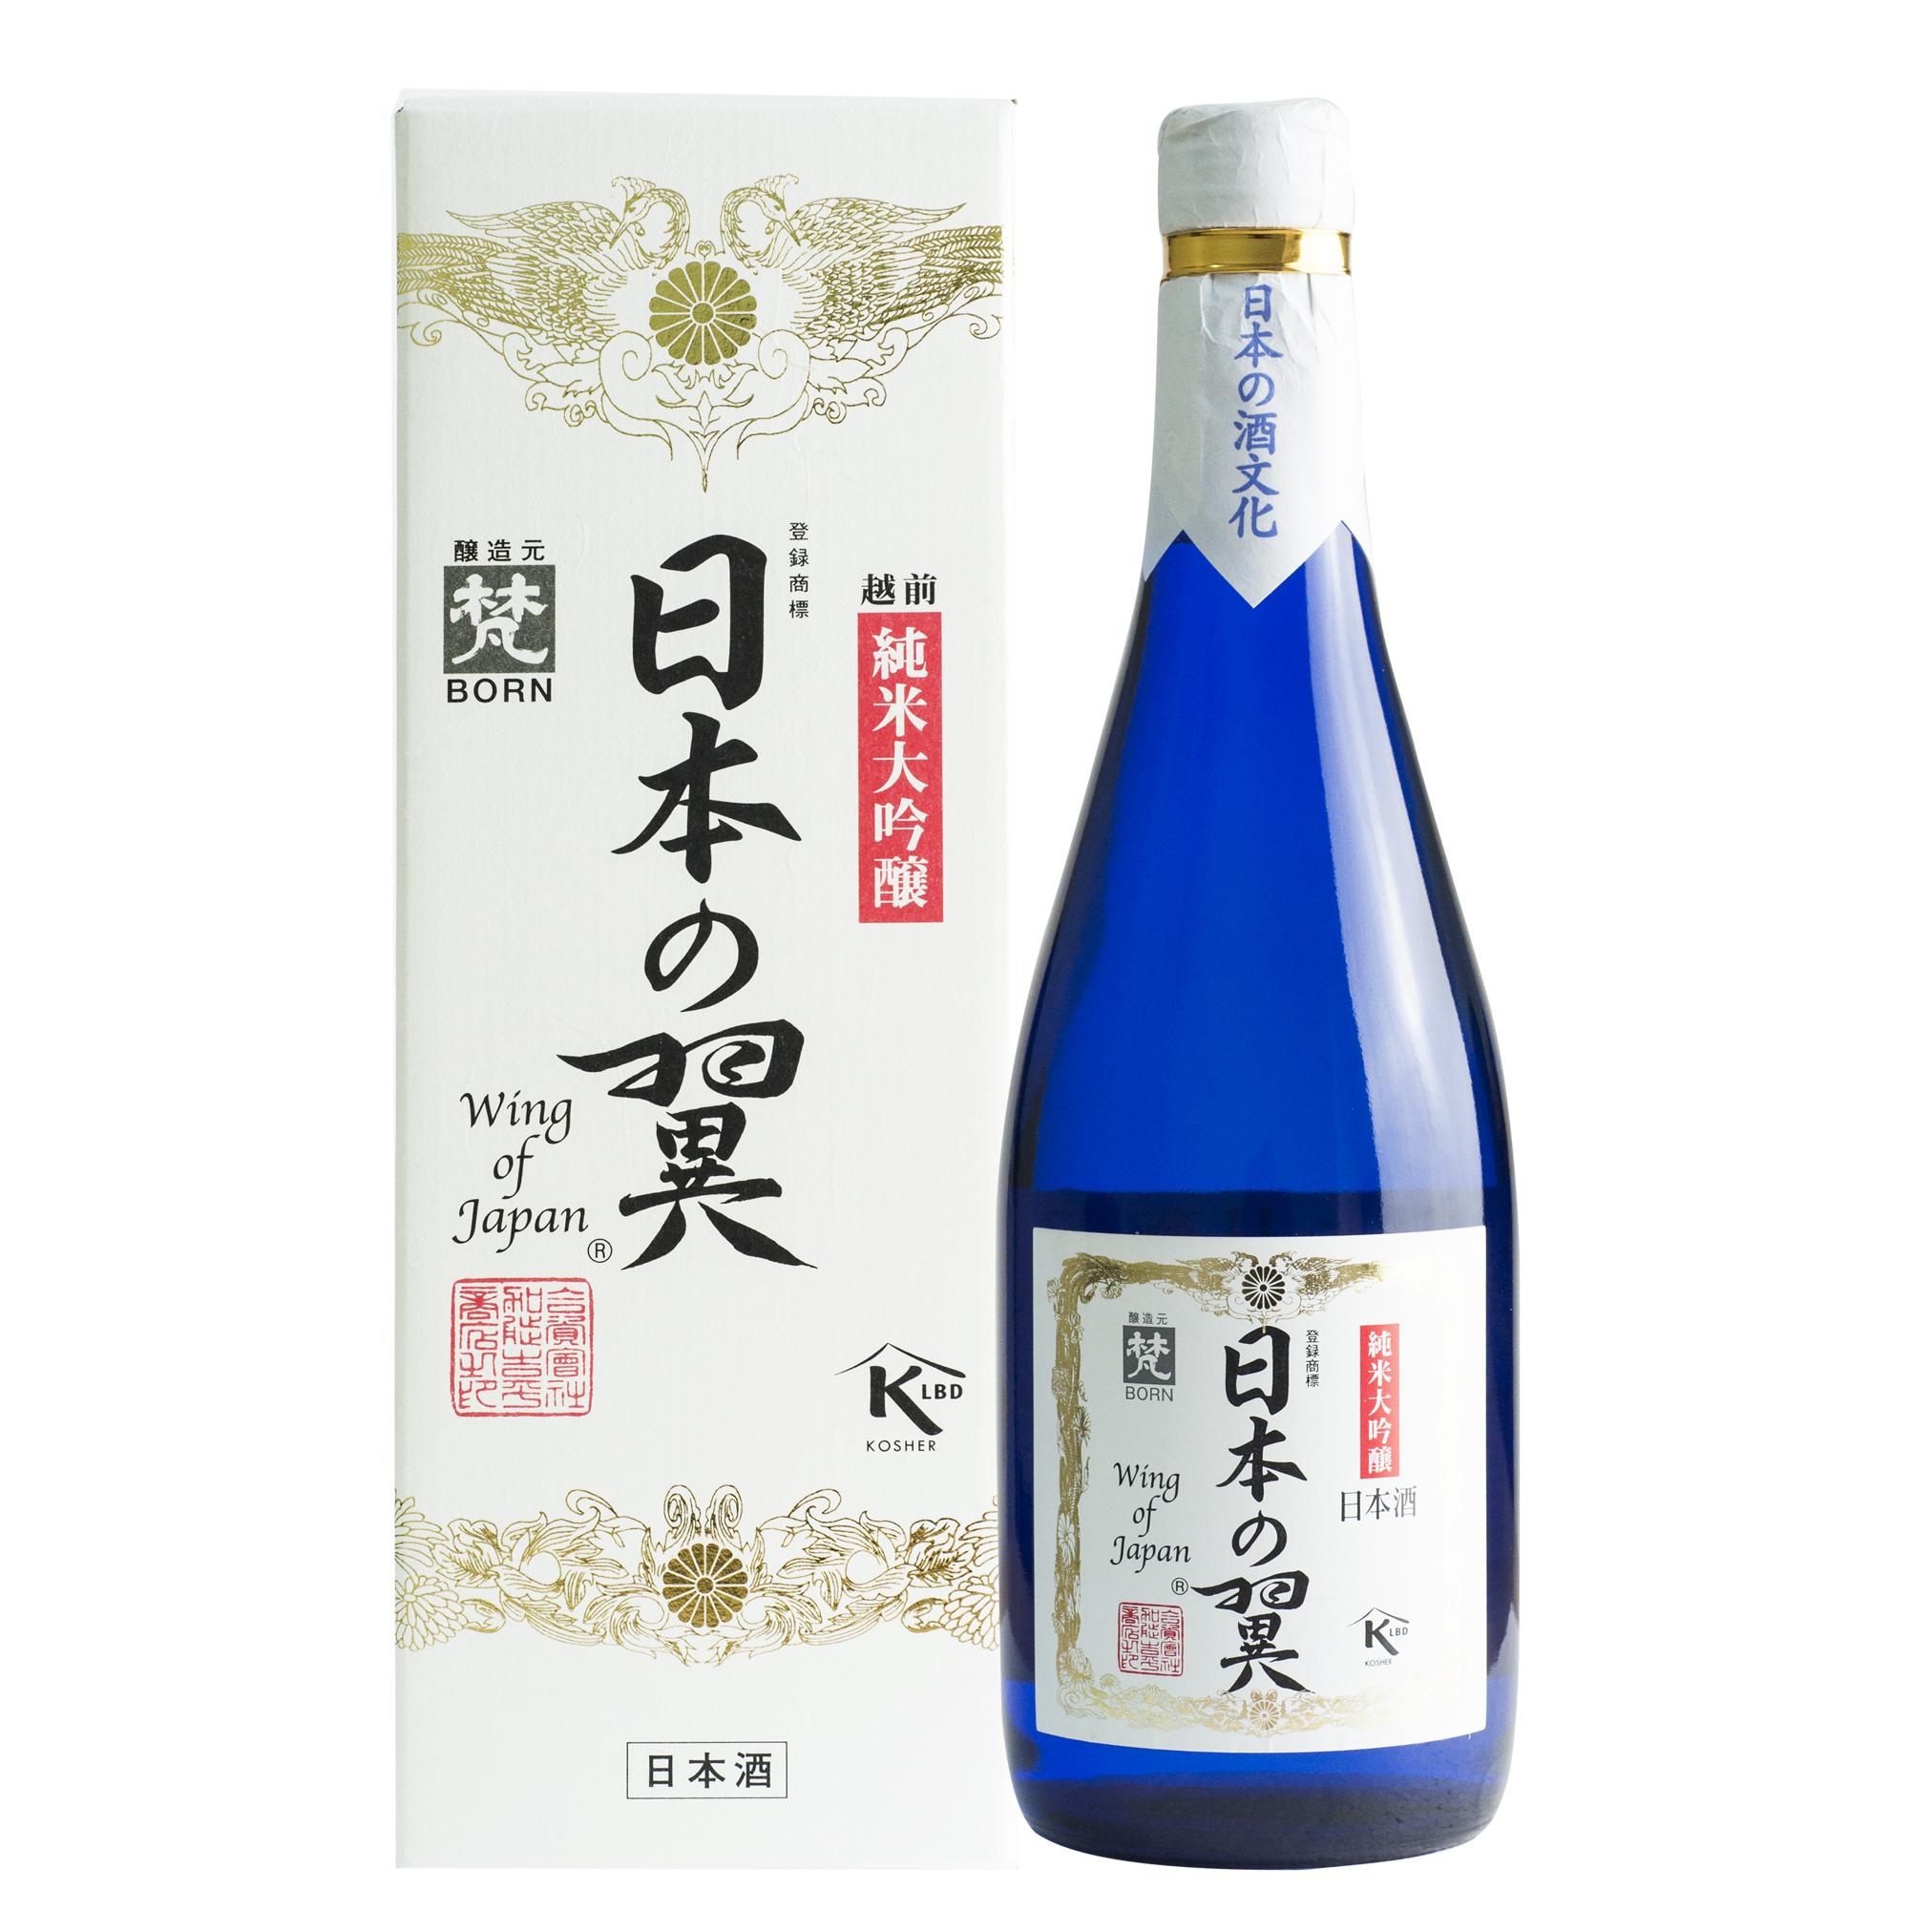 Born Nihonnotsubasa Junmai Daiginjo 16% 720ml